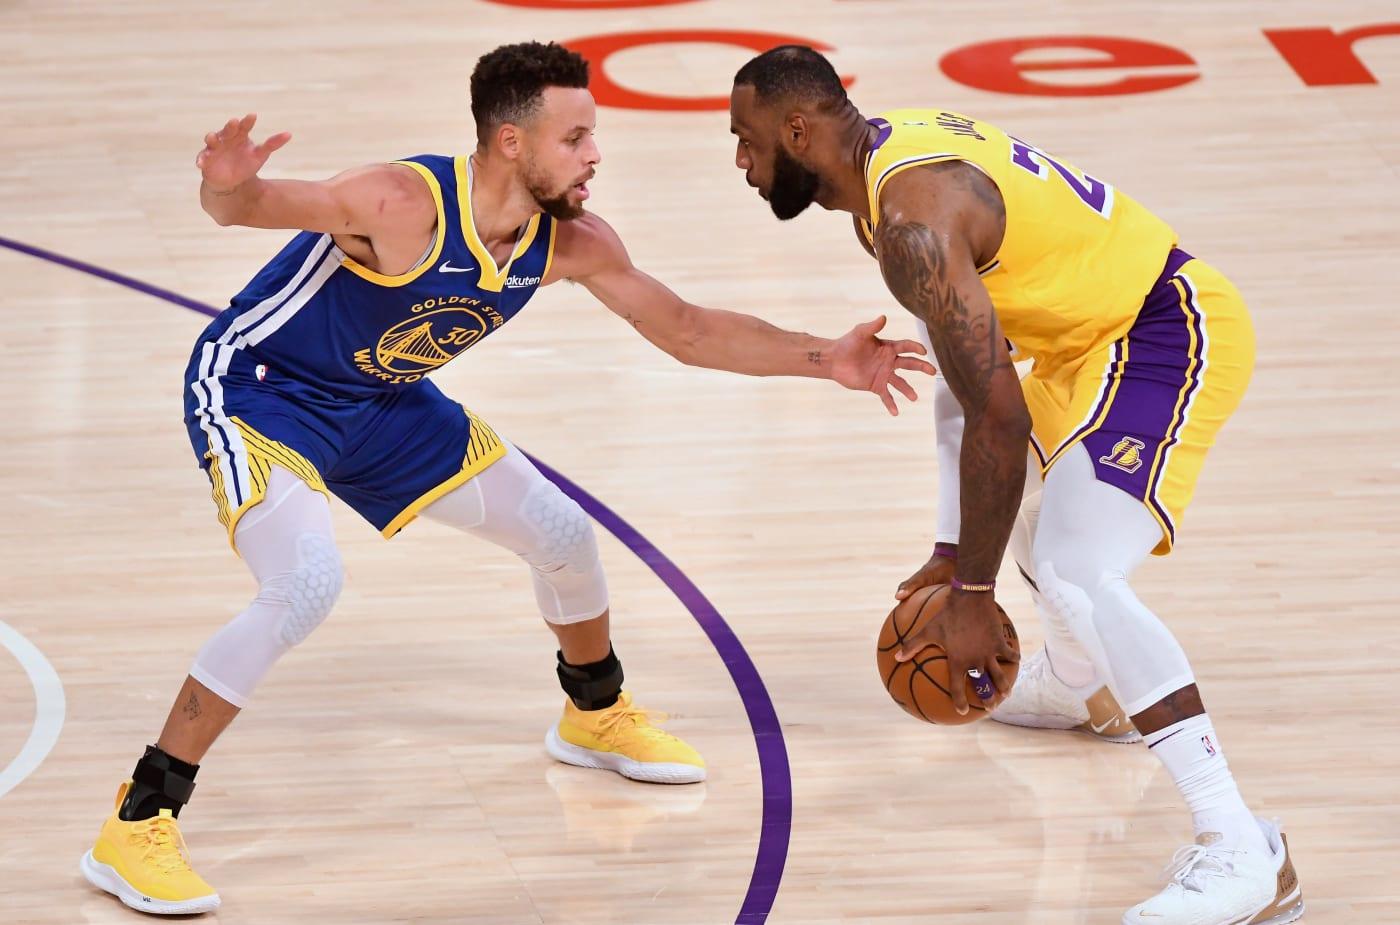 Steph Curry LeBron James Staples Center 2021